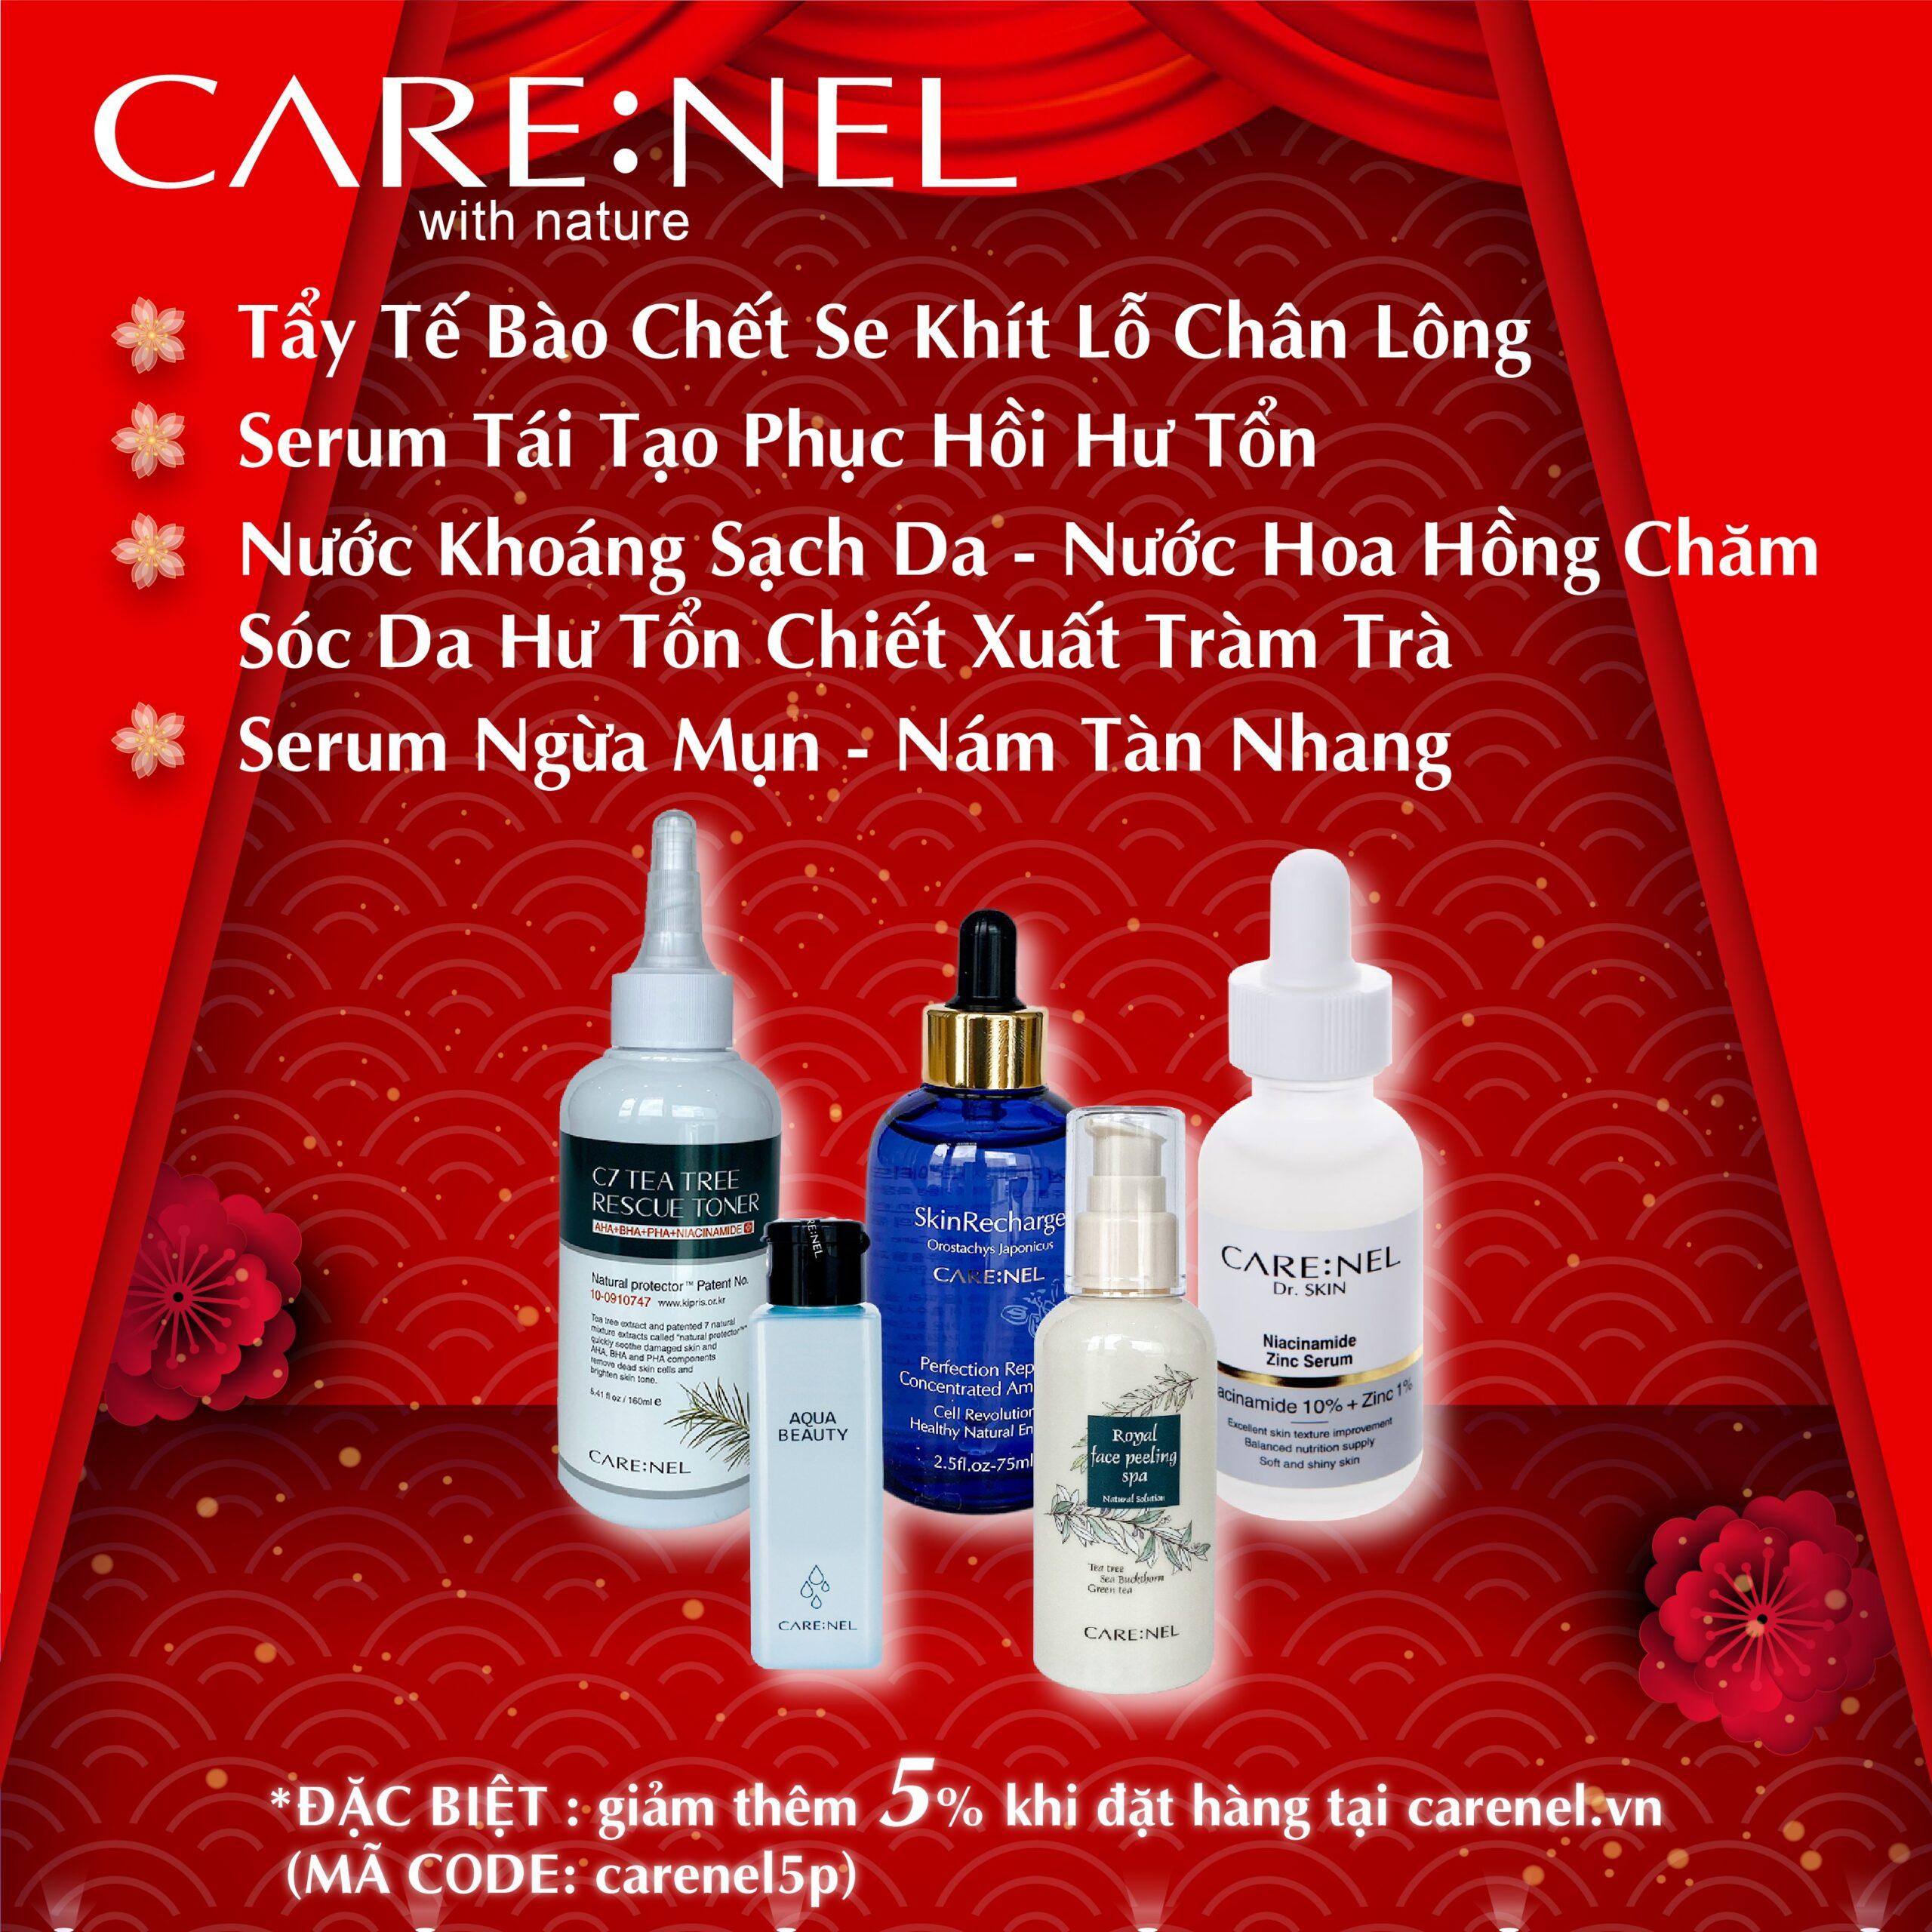 Chuong Trinh Uu Dai Hpny 2021 Carenel 1